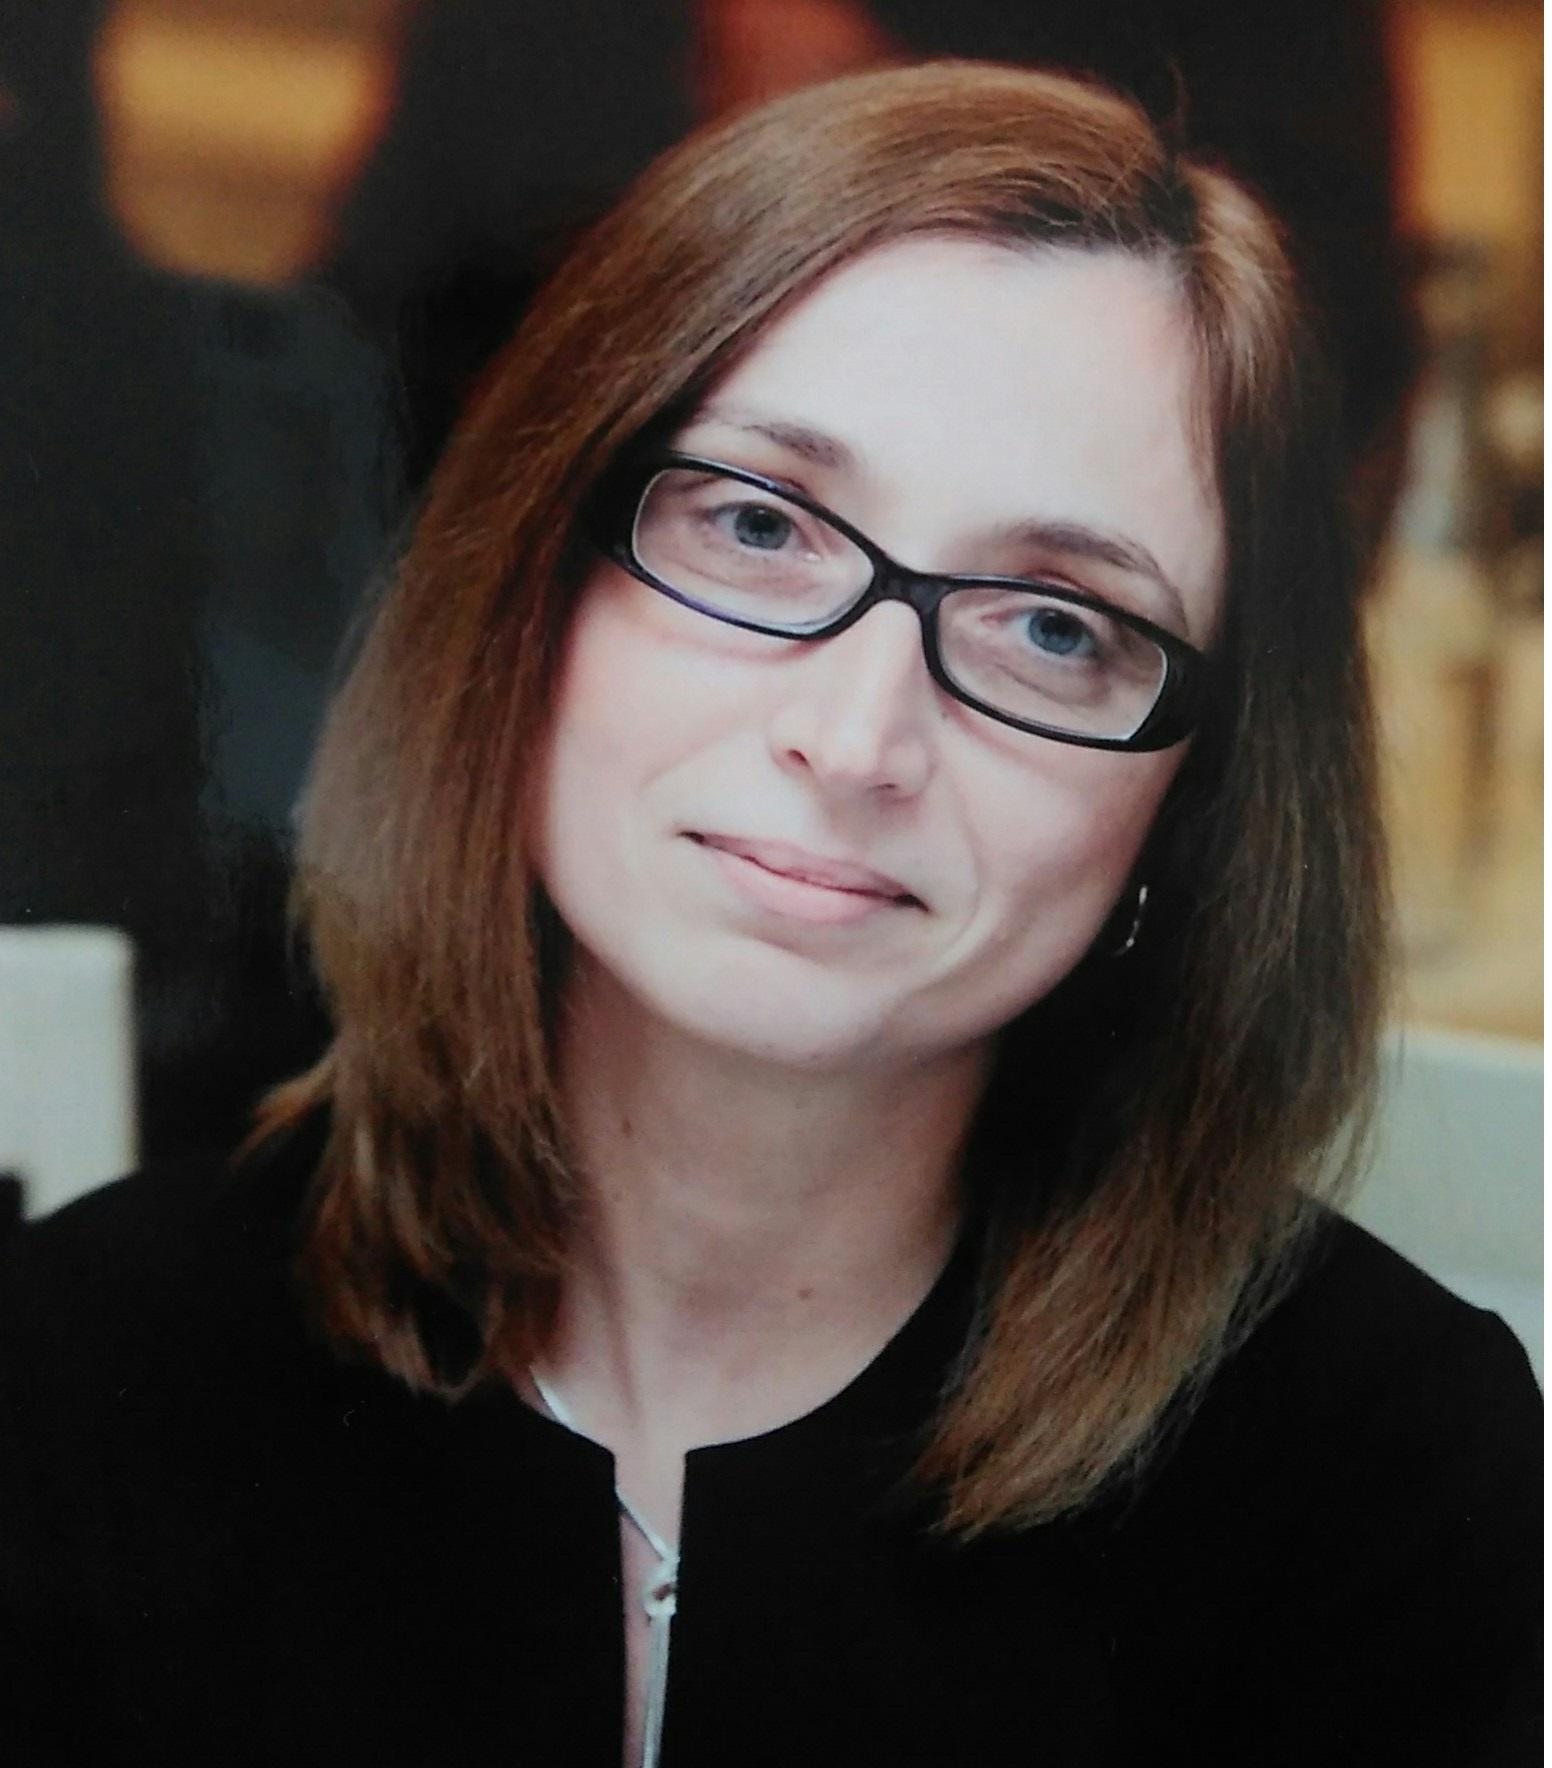 гл. ас. д-р Силвия Братоева-Манолева